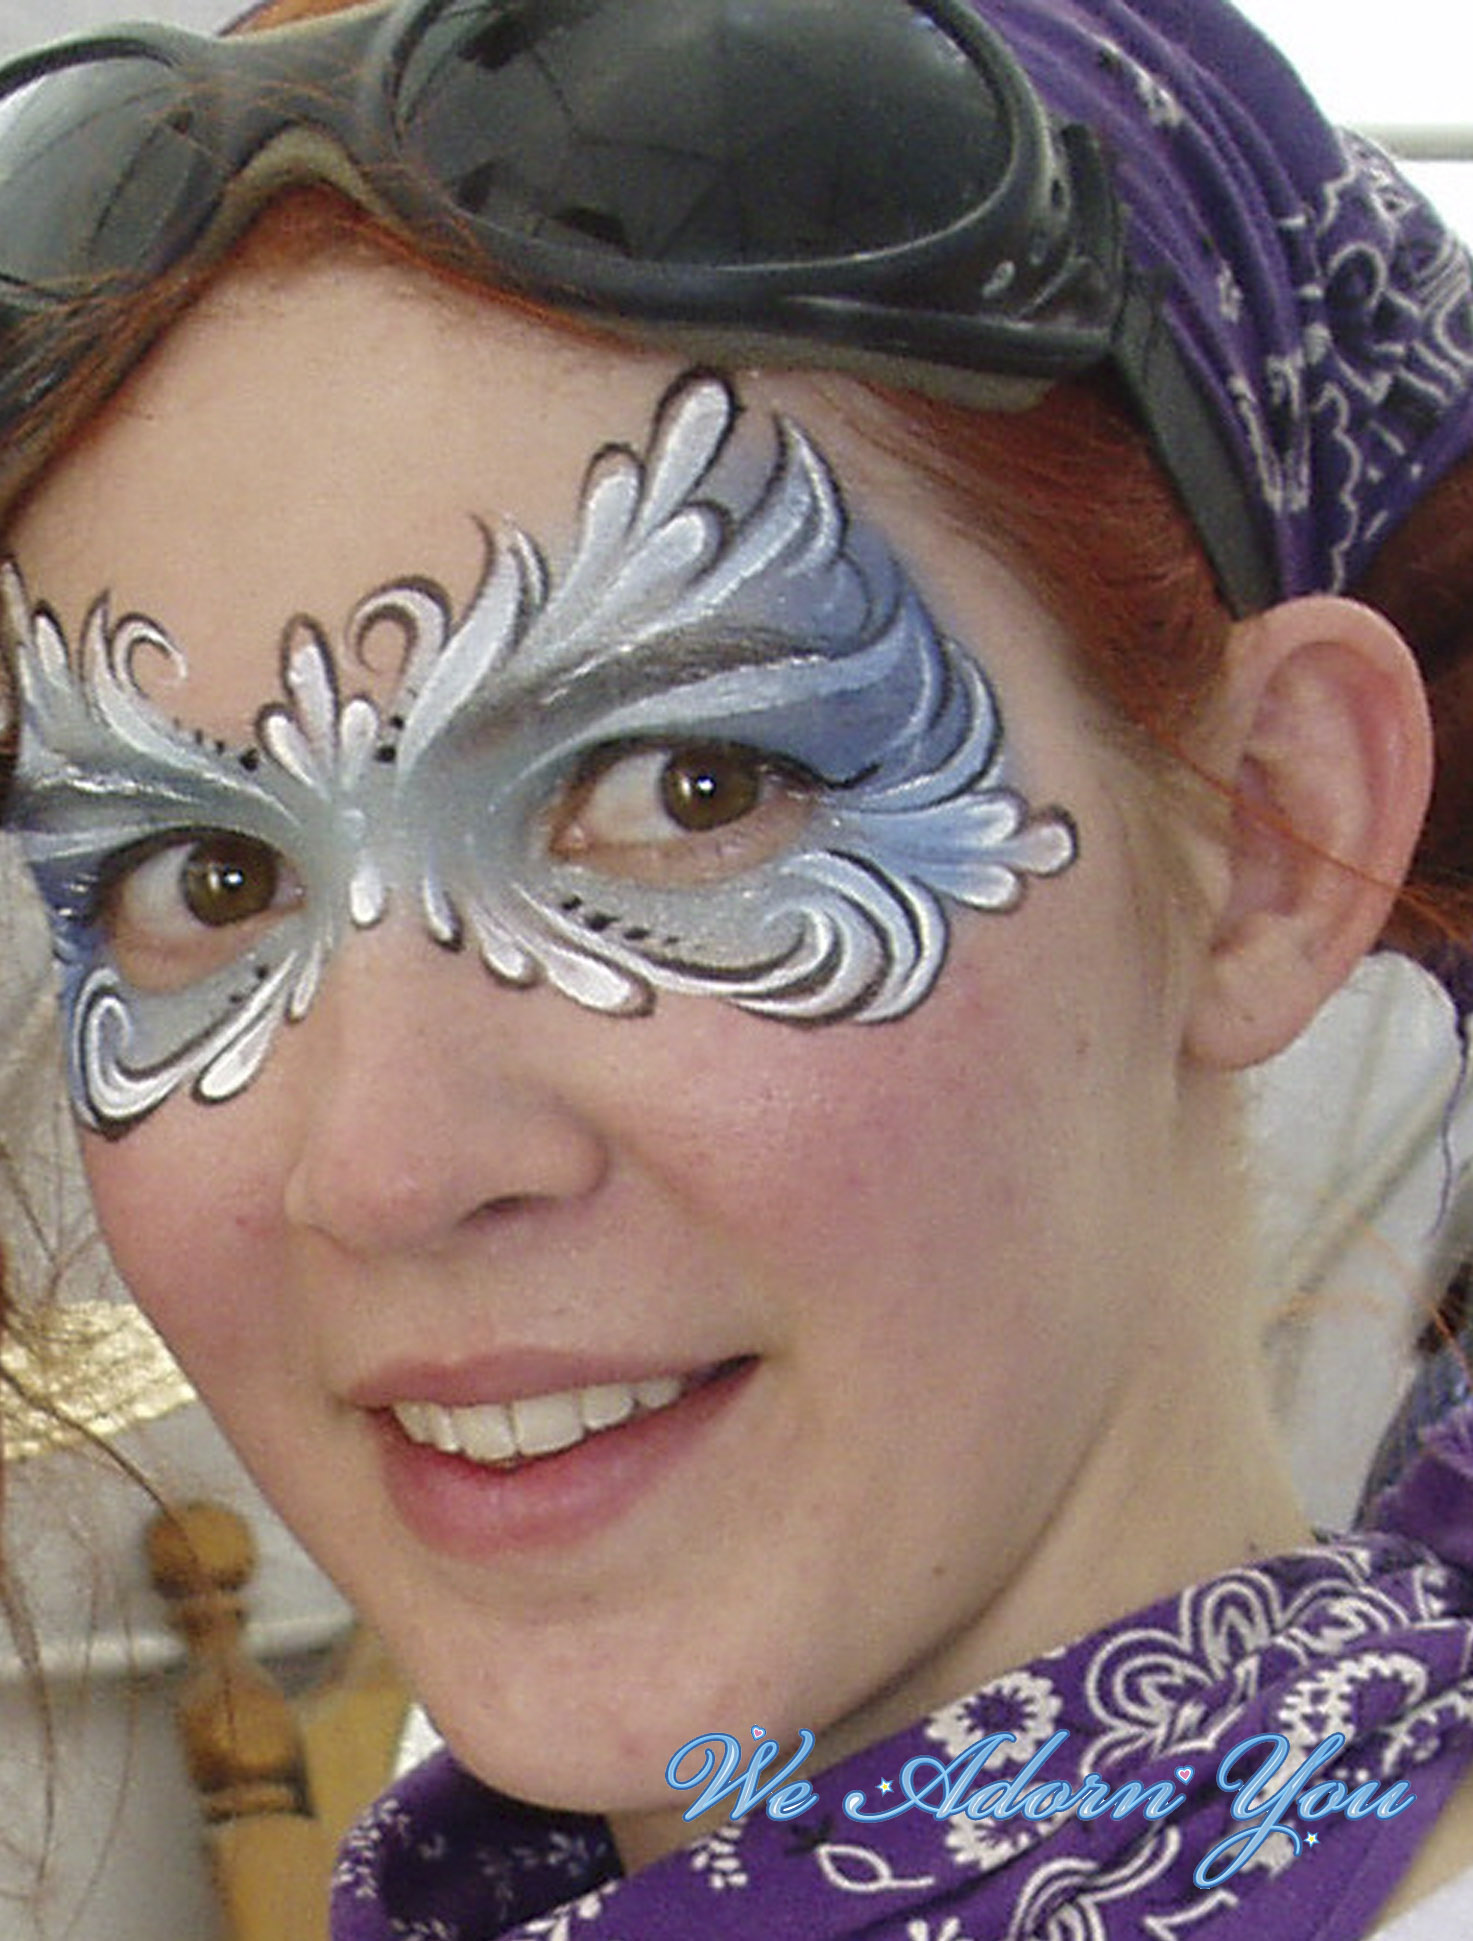 Face Painting Burning Man Mask - We Adorn You.jpg